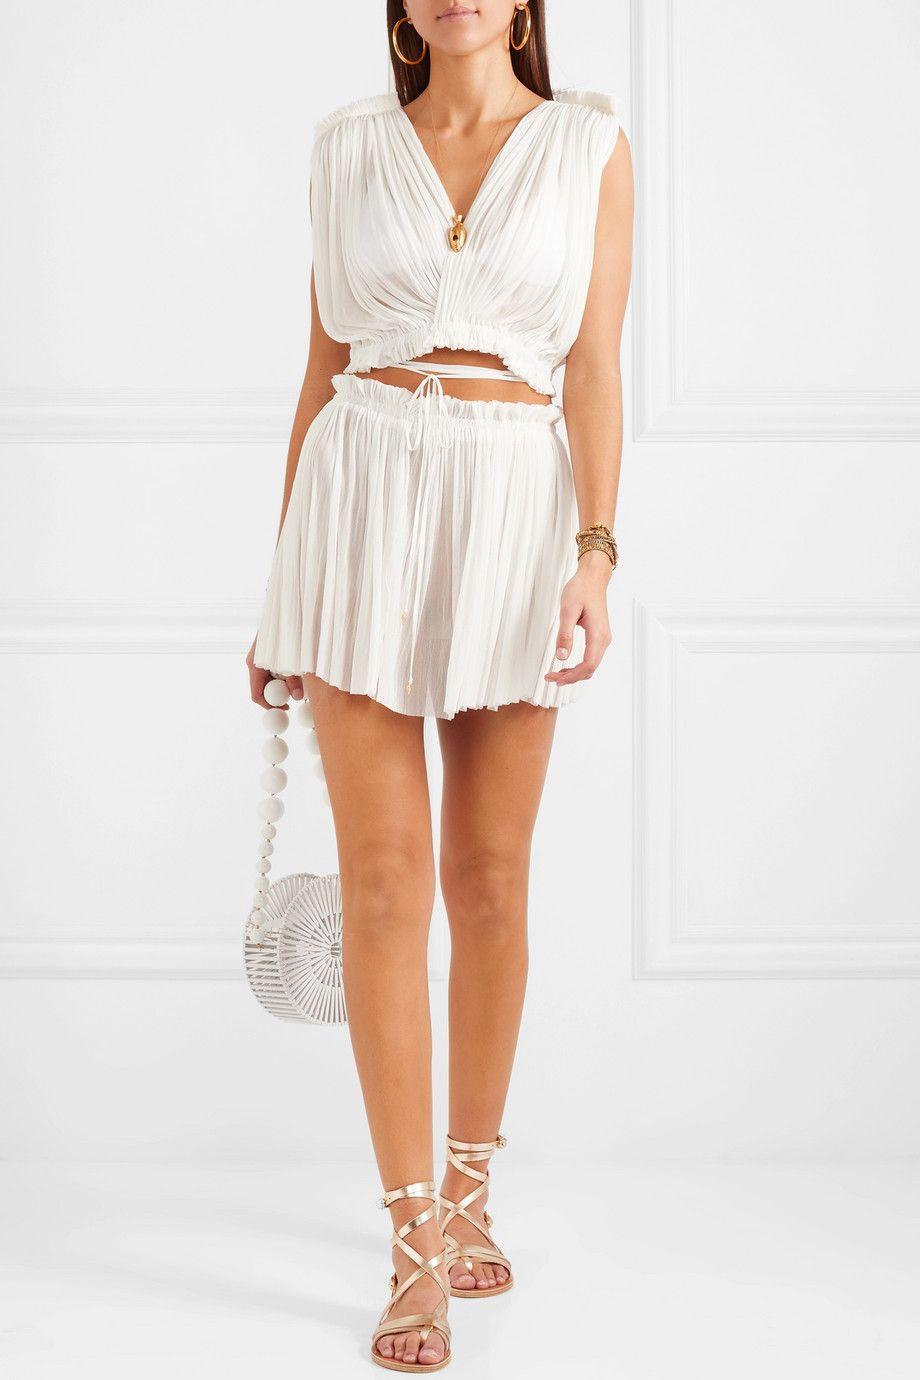 e2f0c1a06605 Blush pink tulle mini skirt, Girls short tutu skirt 5013 | Products | Tulle  mini skirt, Pink tulle, Fancy skirts